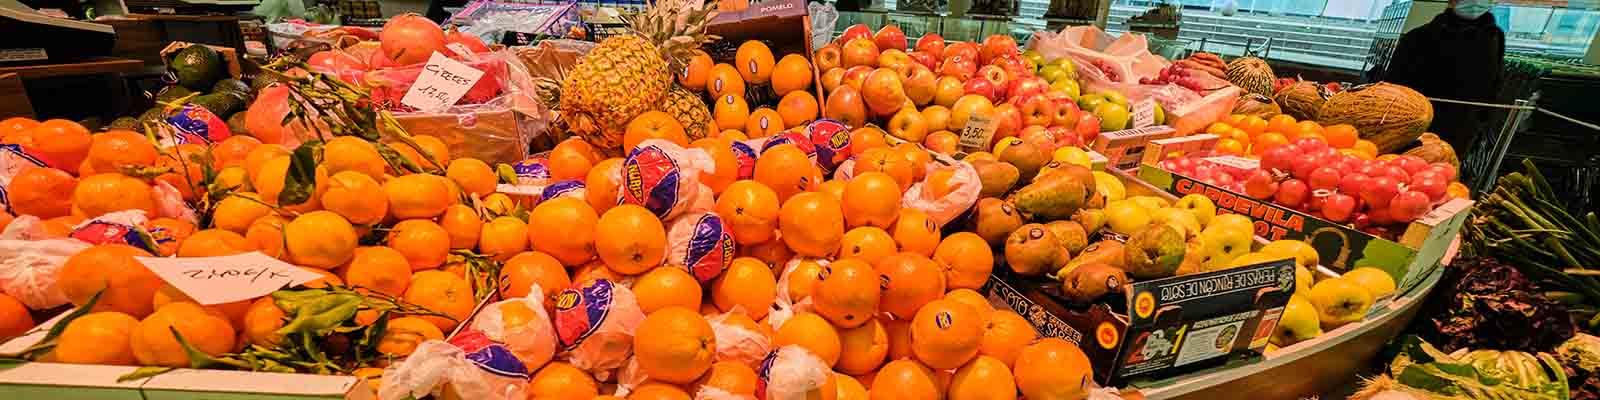 FRUITES I VERDURES VILA BORRULL